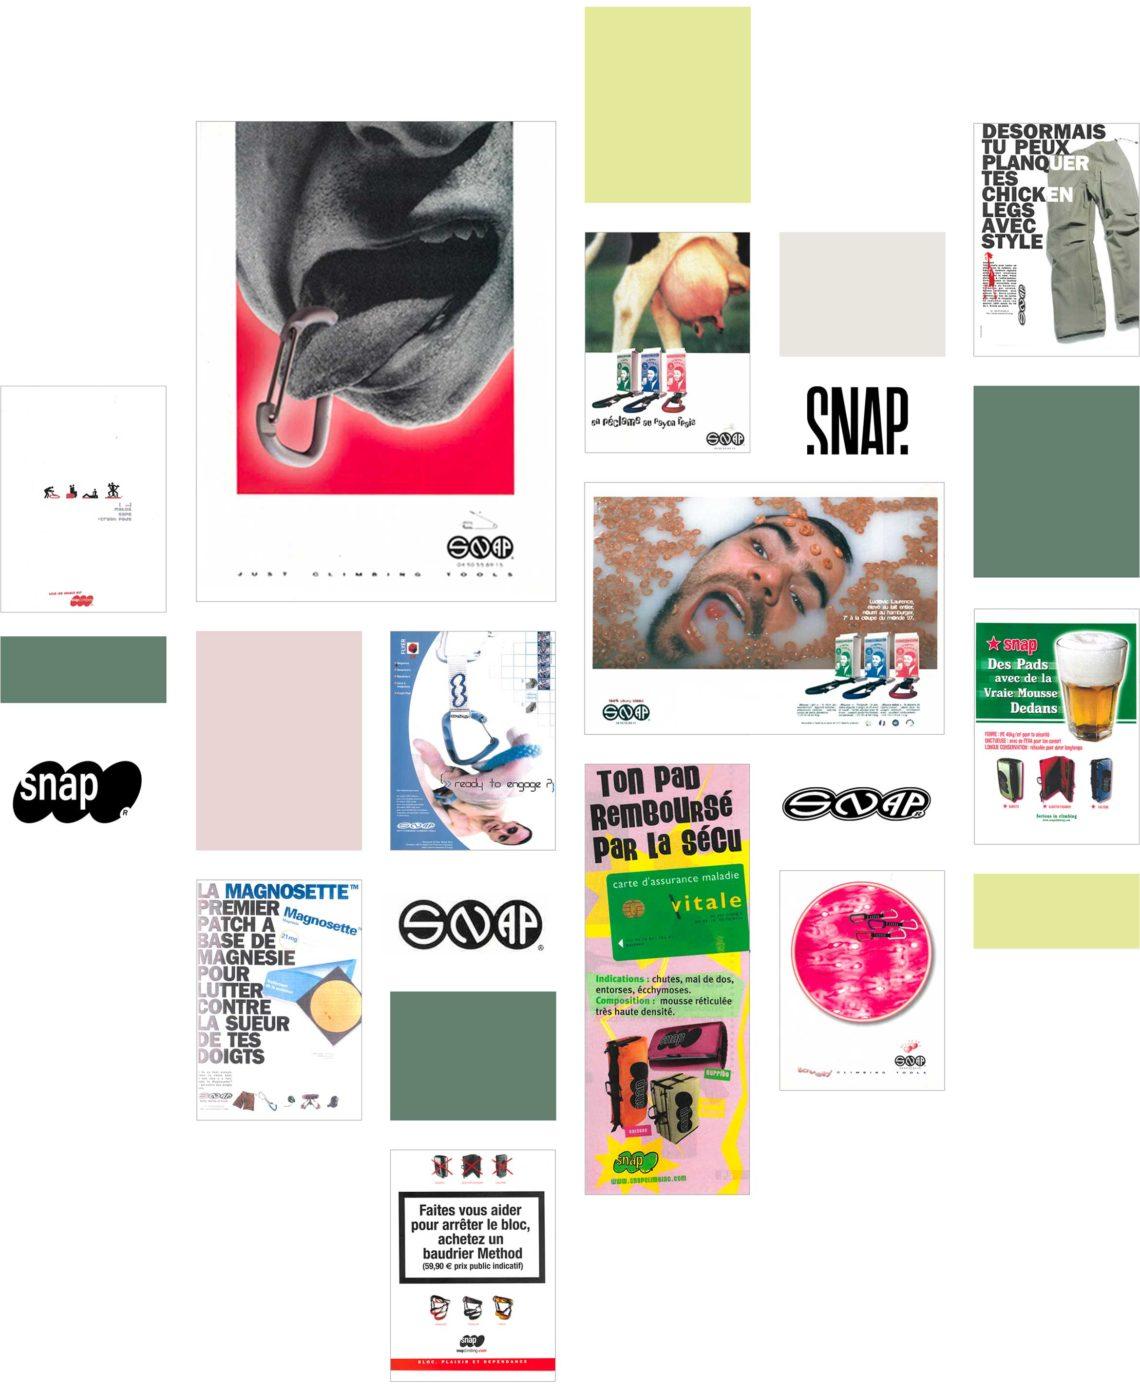 snap_publicites_logos